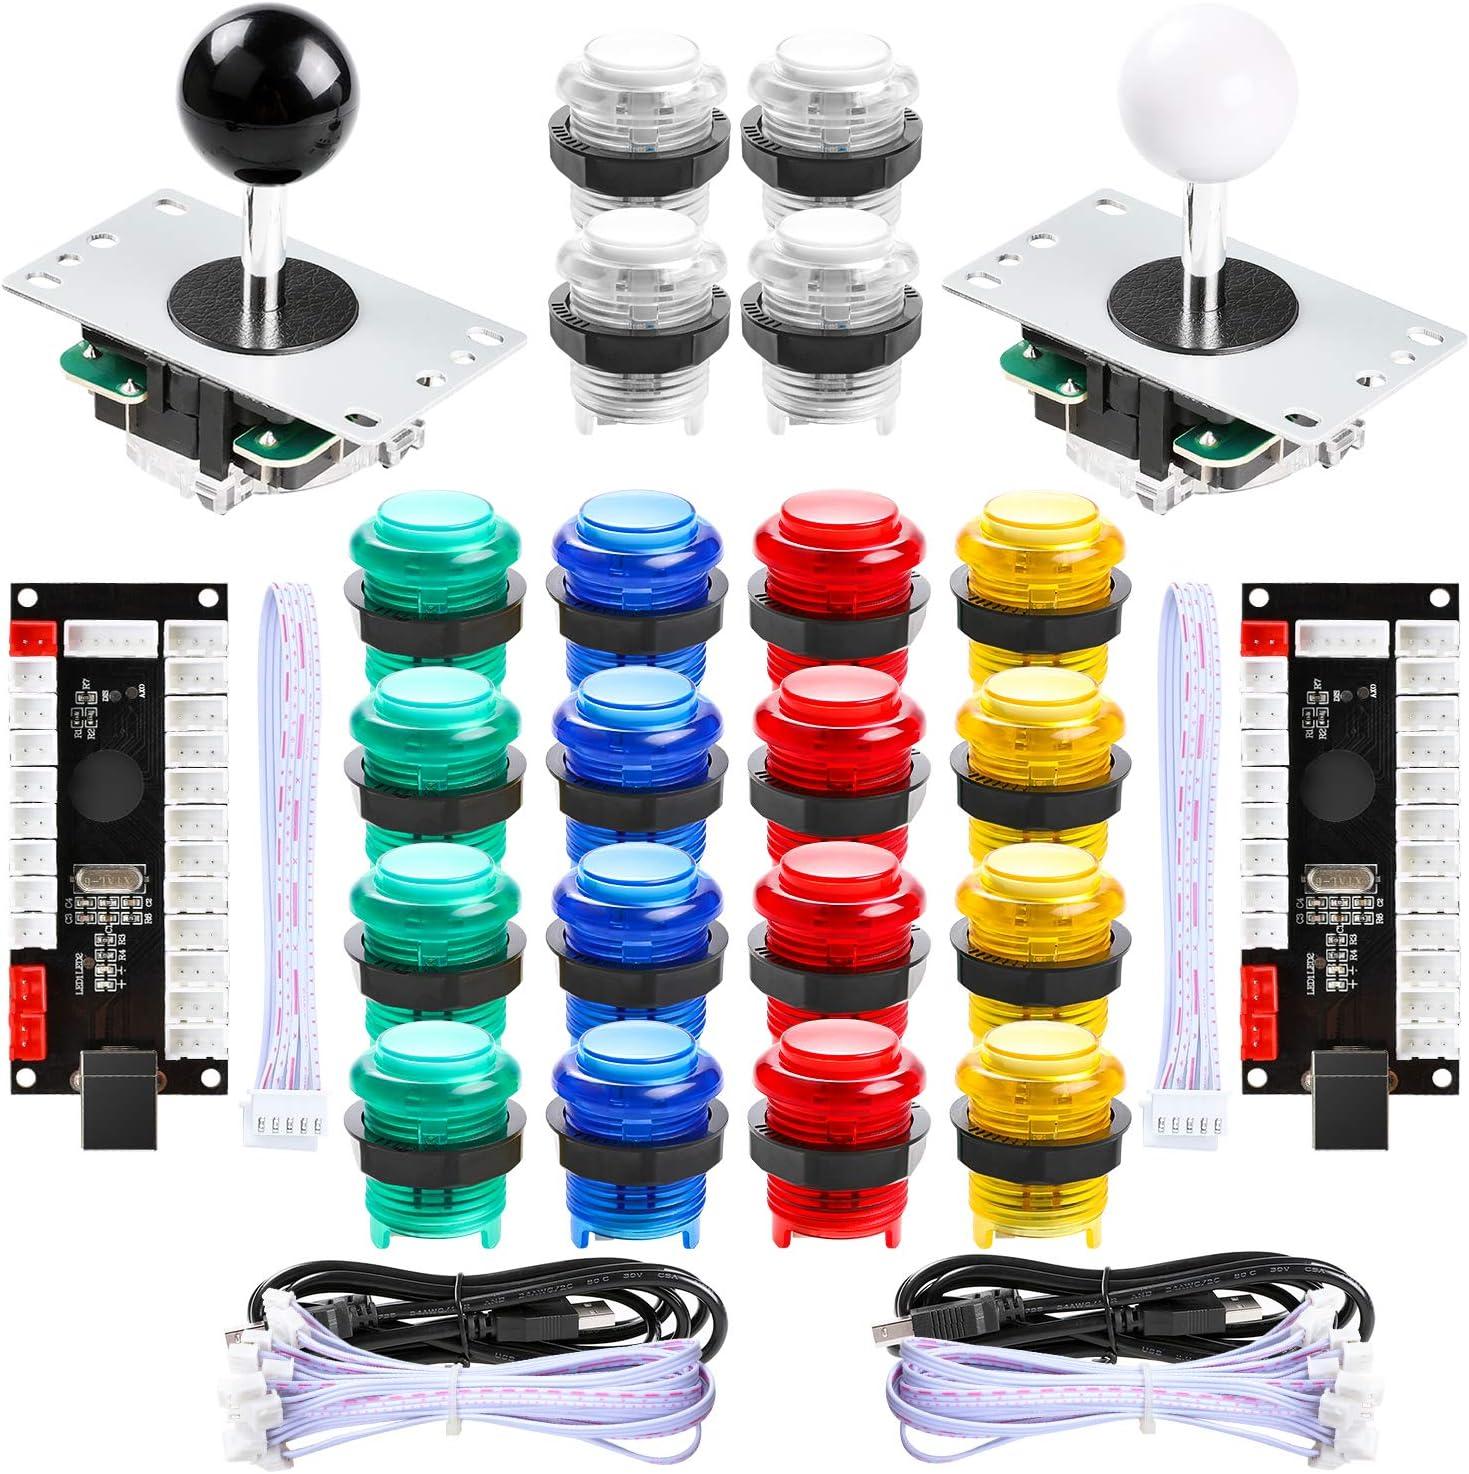 10Pcs Arcade Games DIY Kit Parts Including 1P /& 2P Start Player Buttons DIY Kit for Arcade Game